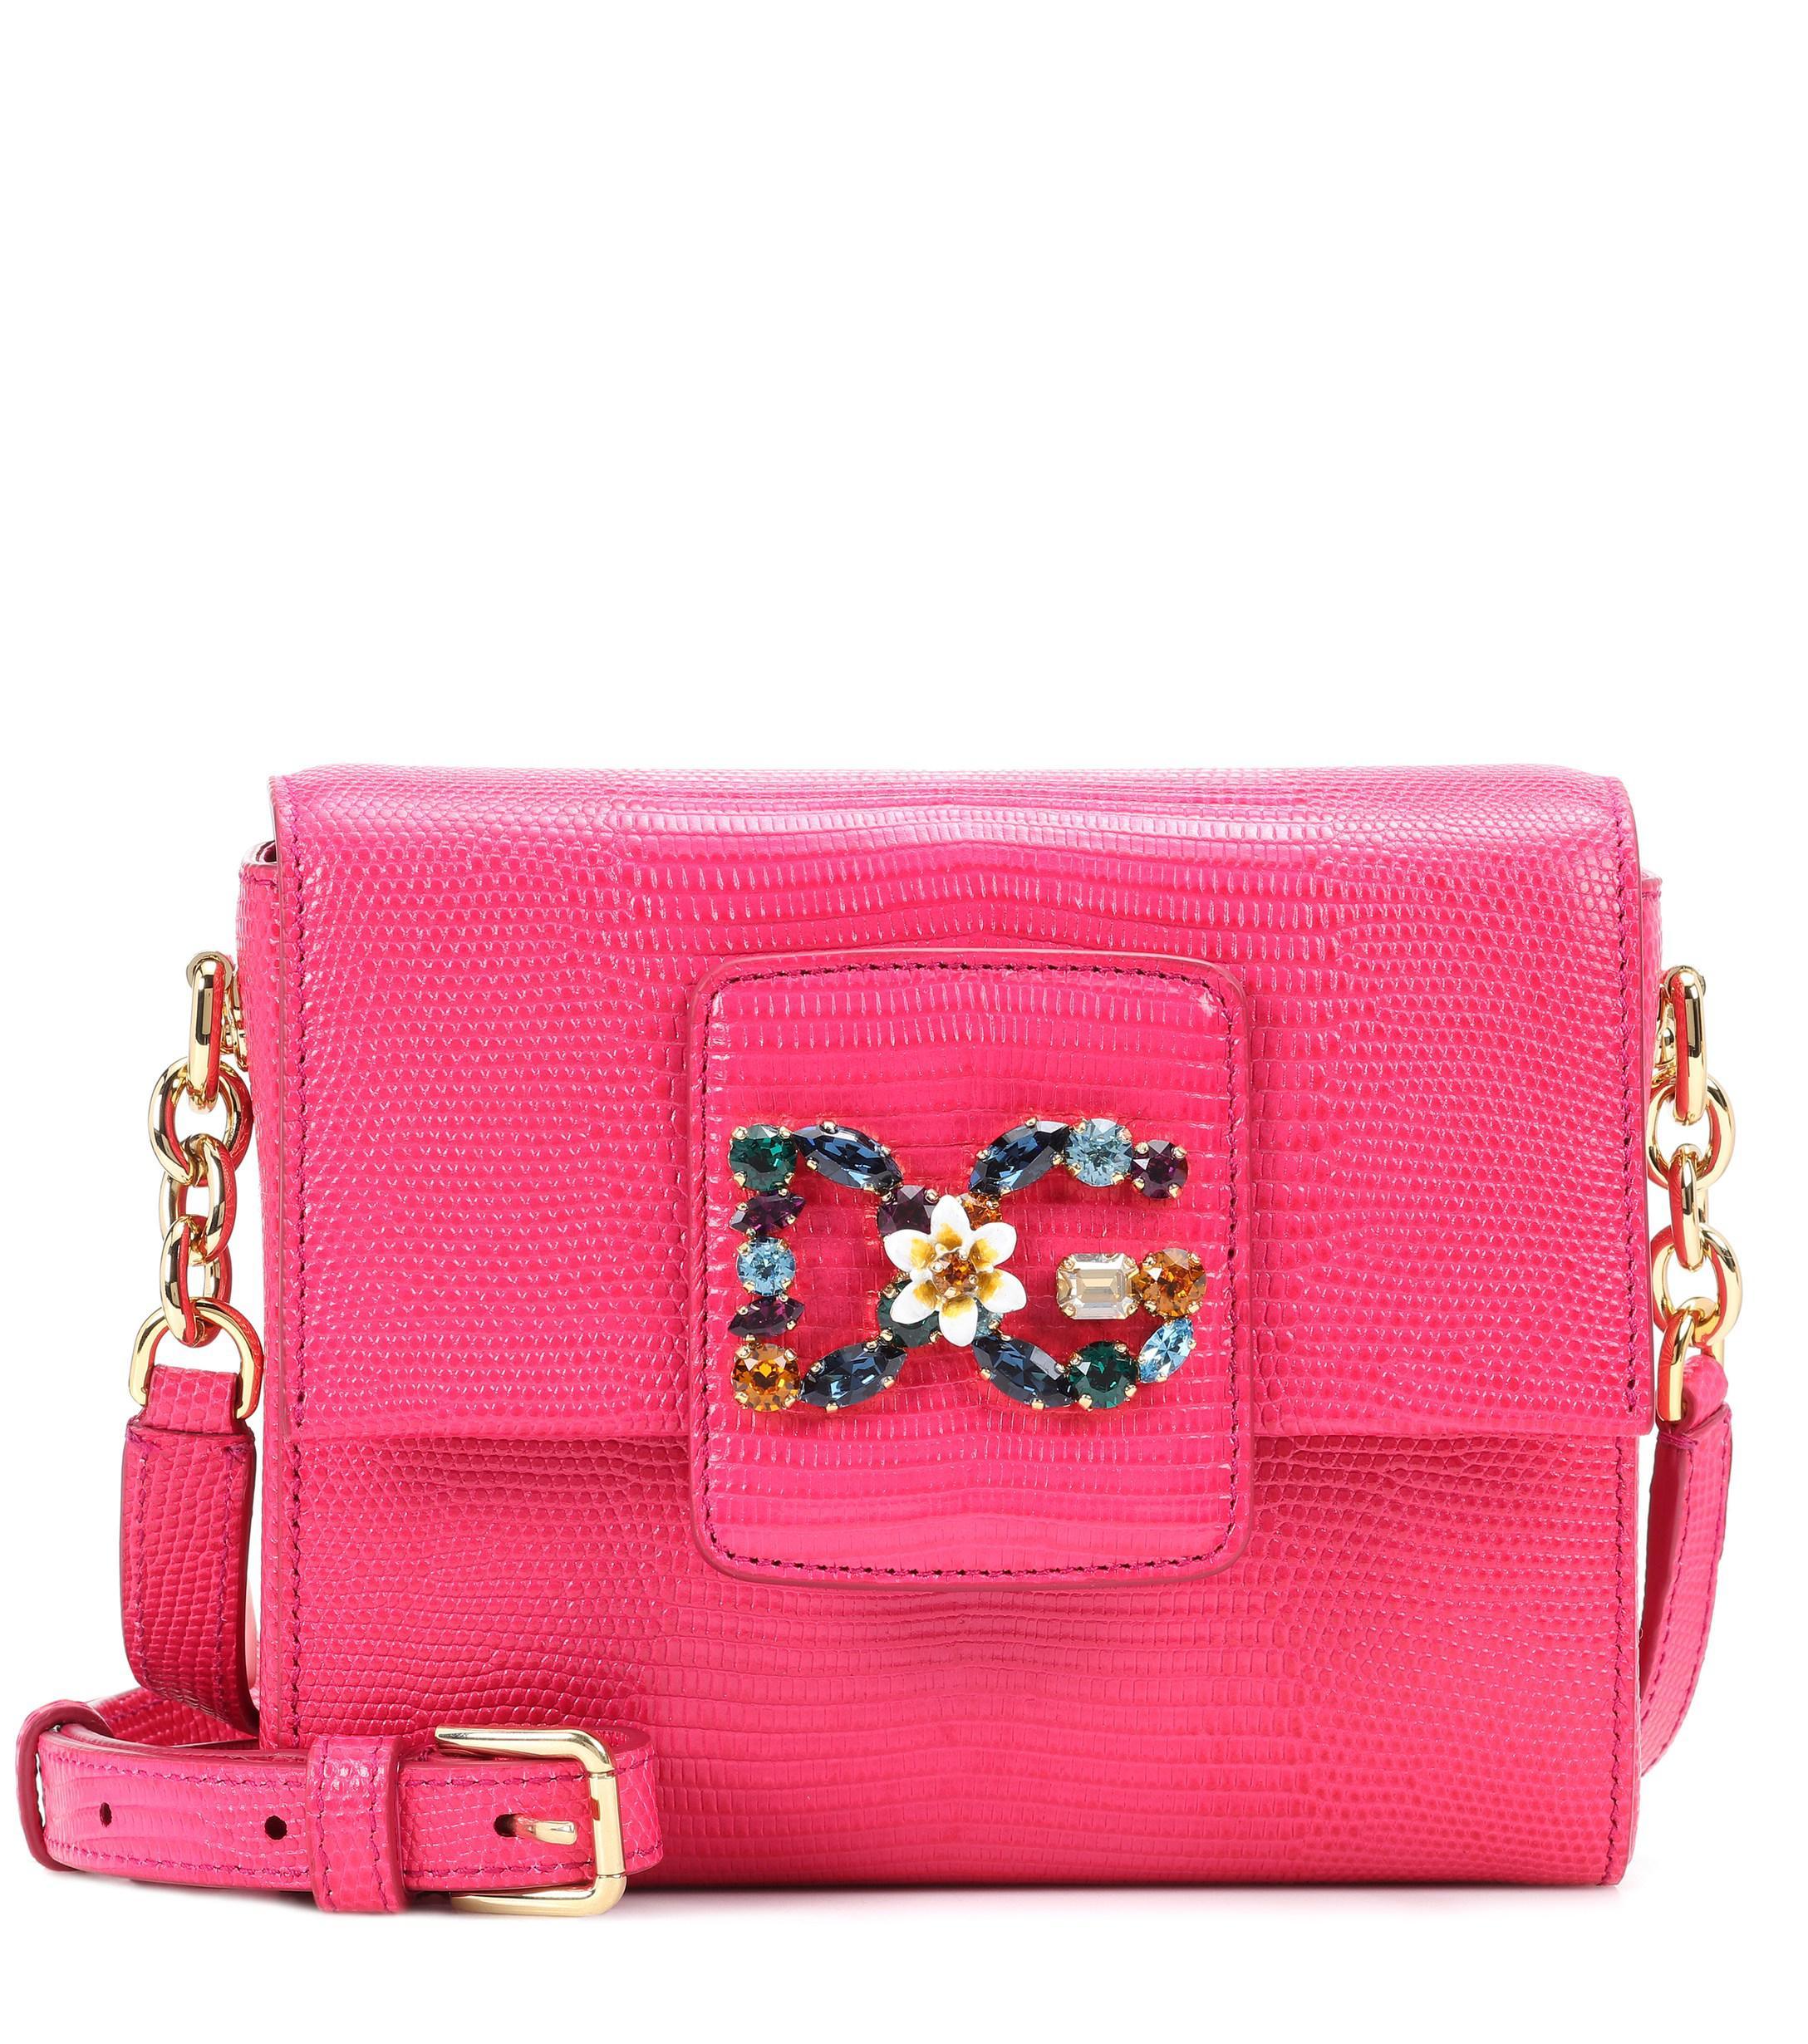 Dolce   Gabbana Dg Millennials Mini Leather Shoulder Bag in Pink - Lyst 0f828b03361e9